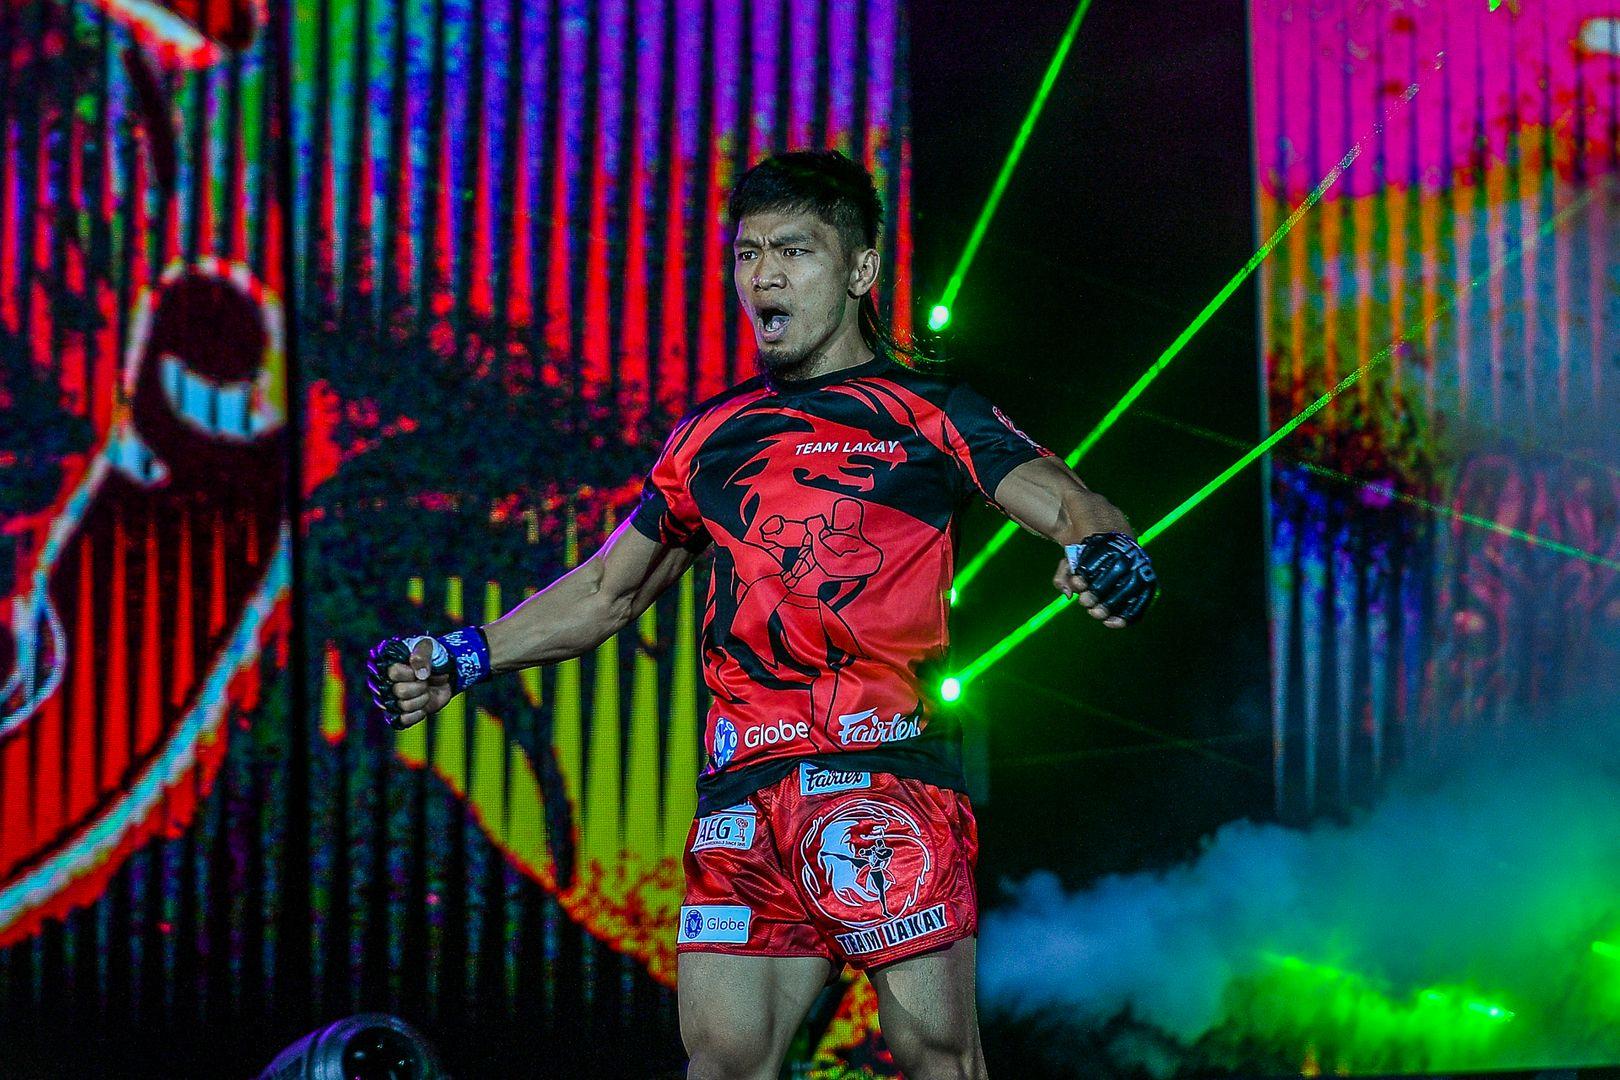 Filipino MMA star Lito Adiwang enters the Arena